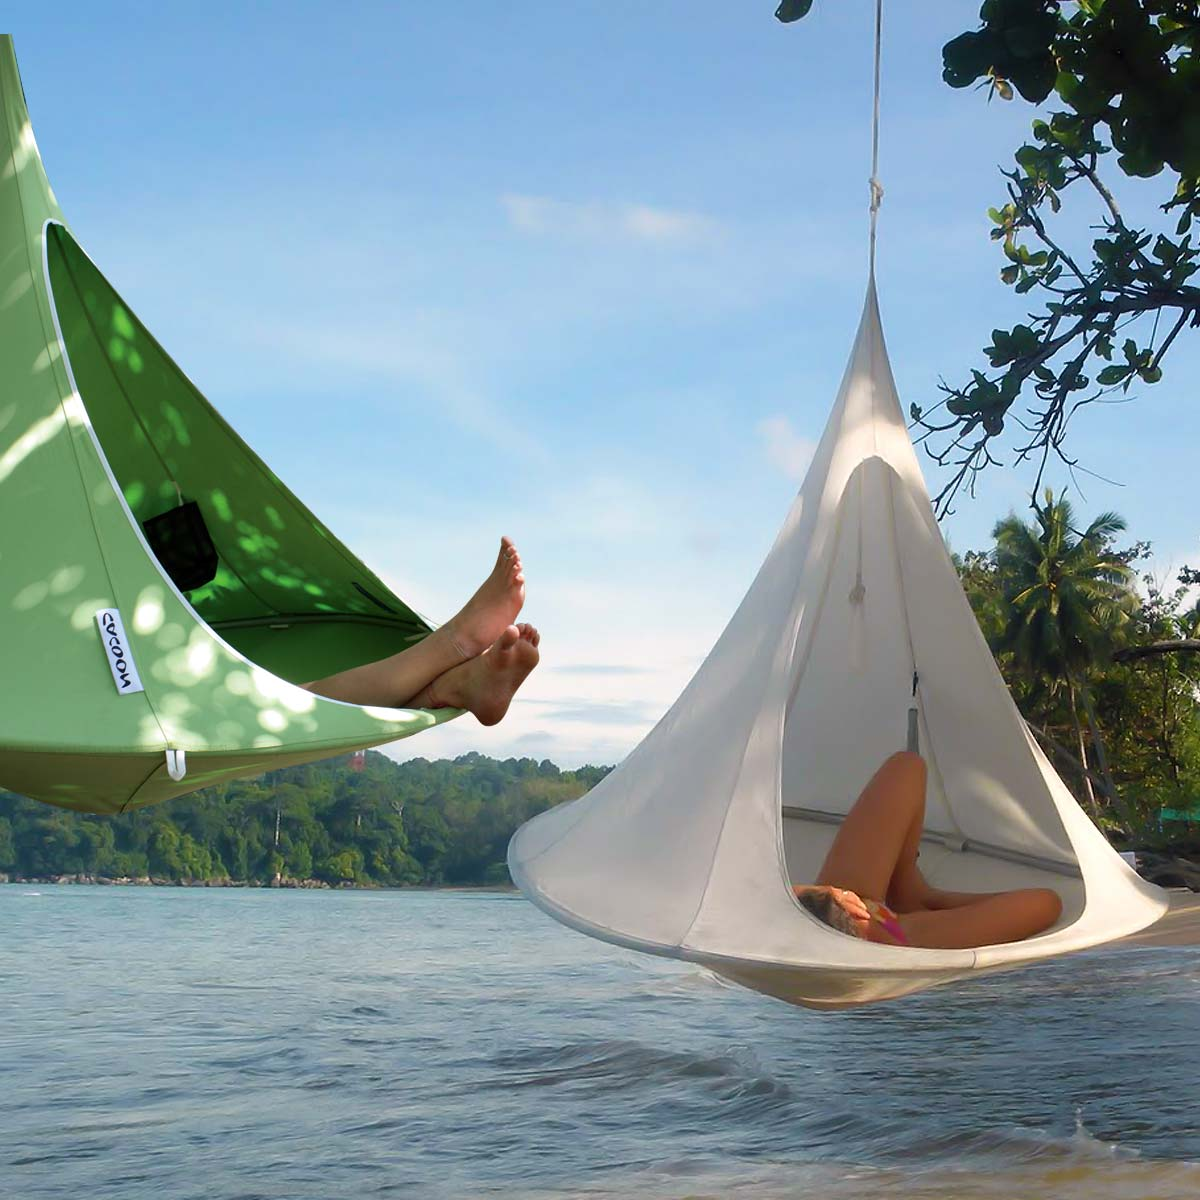 tipi suspendu tente cacoon tentes hamacs voiles. Black Bedroom Furniture Sets. Home Design Ideas